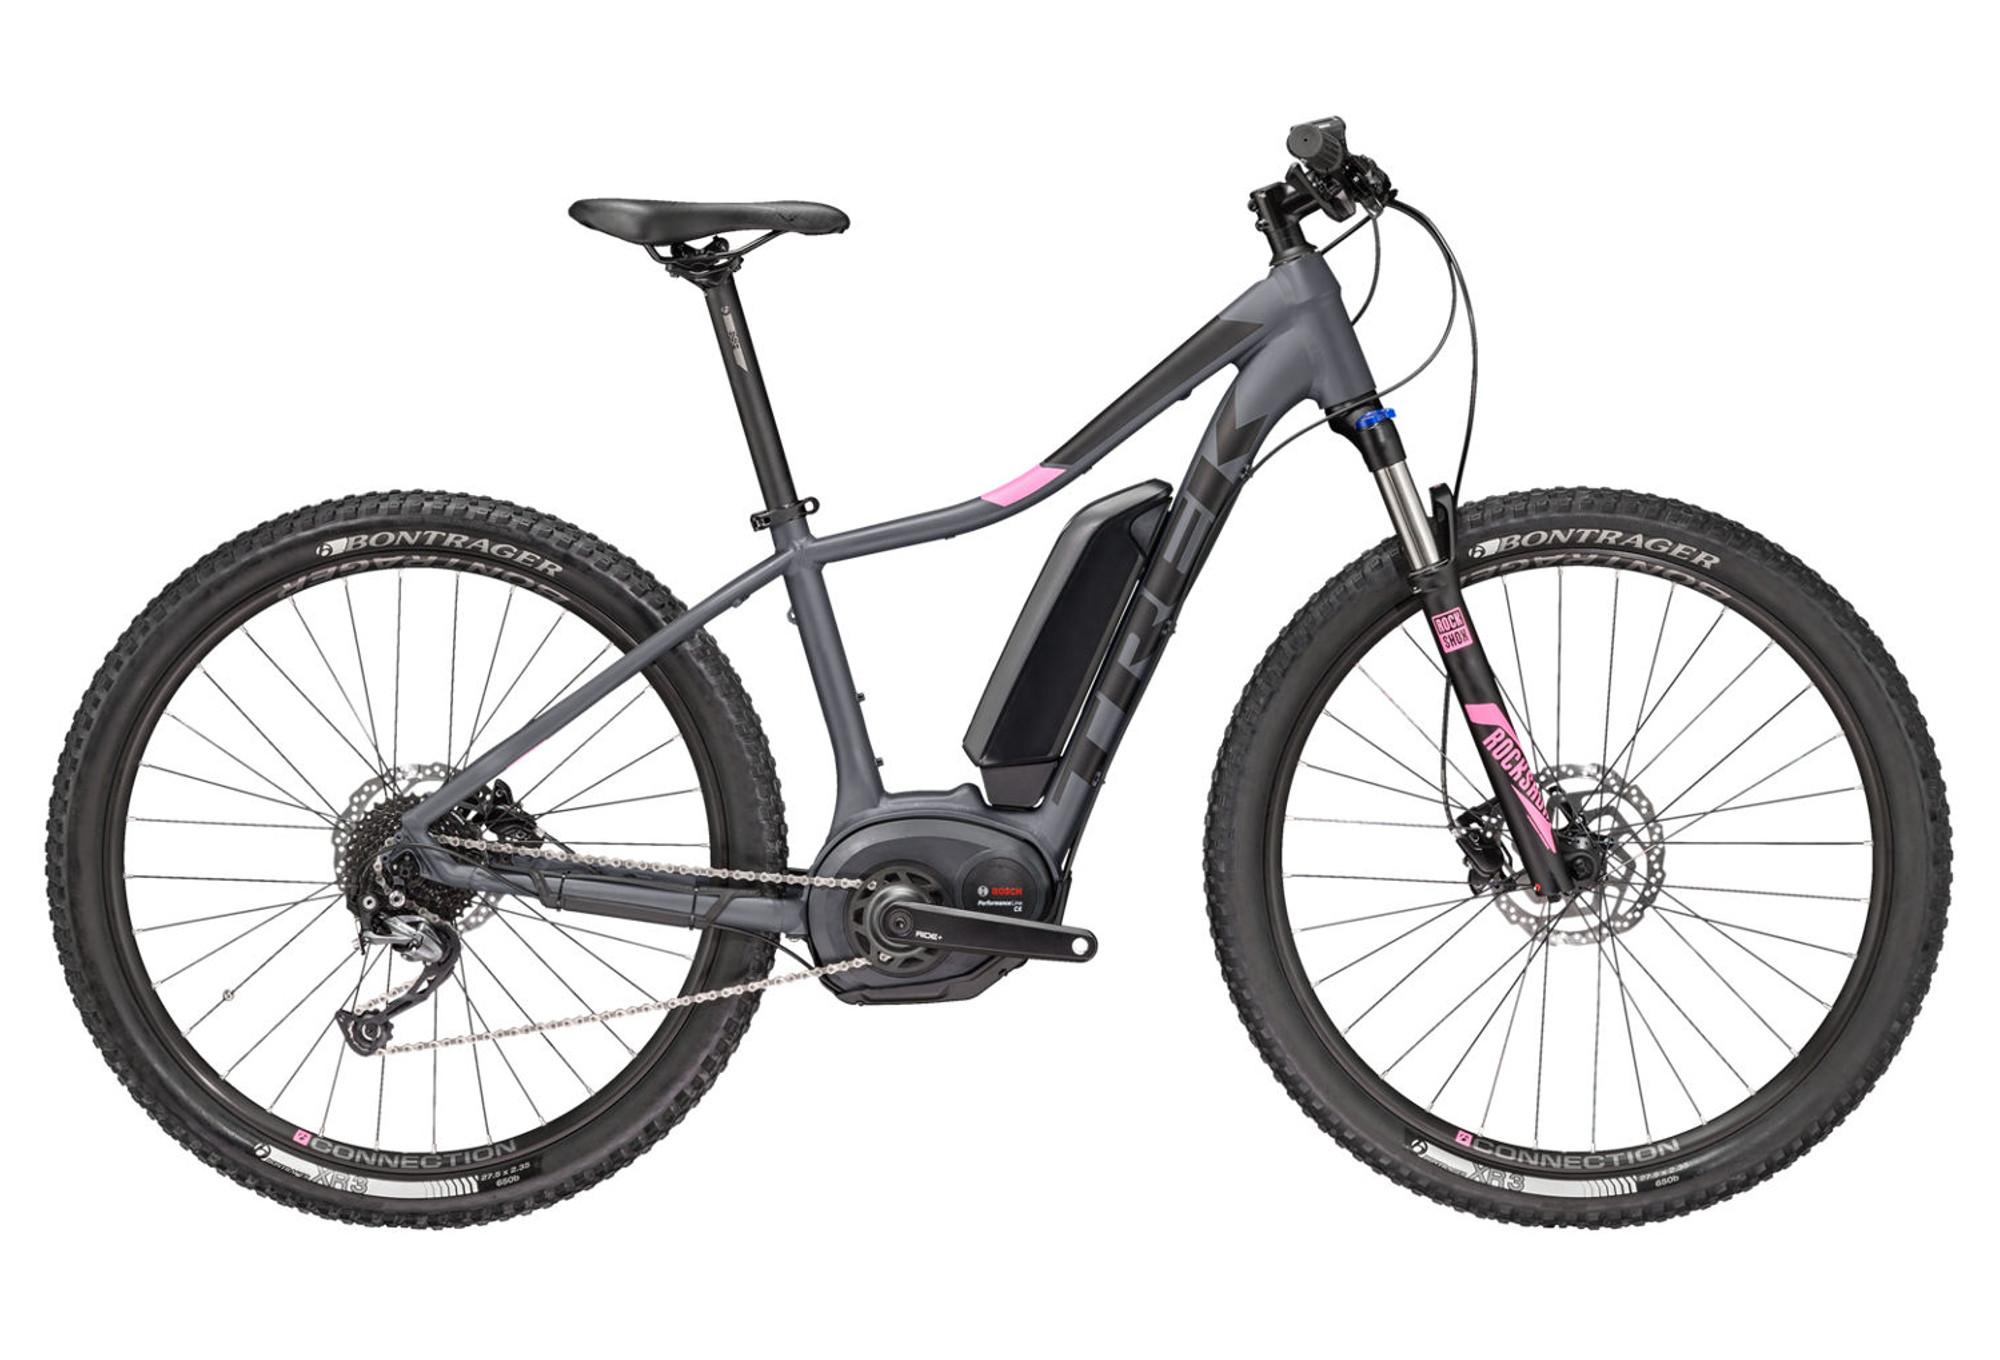 trek powerfly 4 2018 e bike 27 5 39 39 grey pink. Black Bedroom Furniture Sets. Home Design Ideas